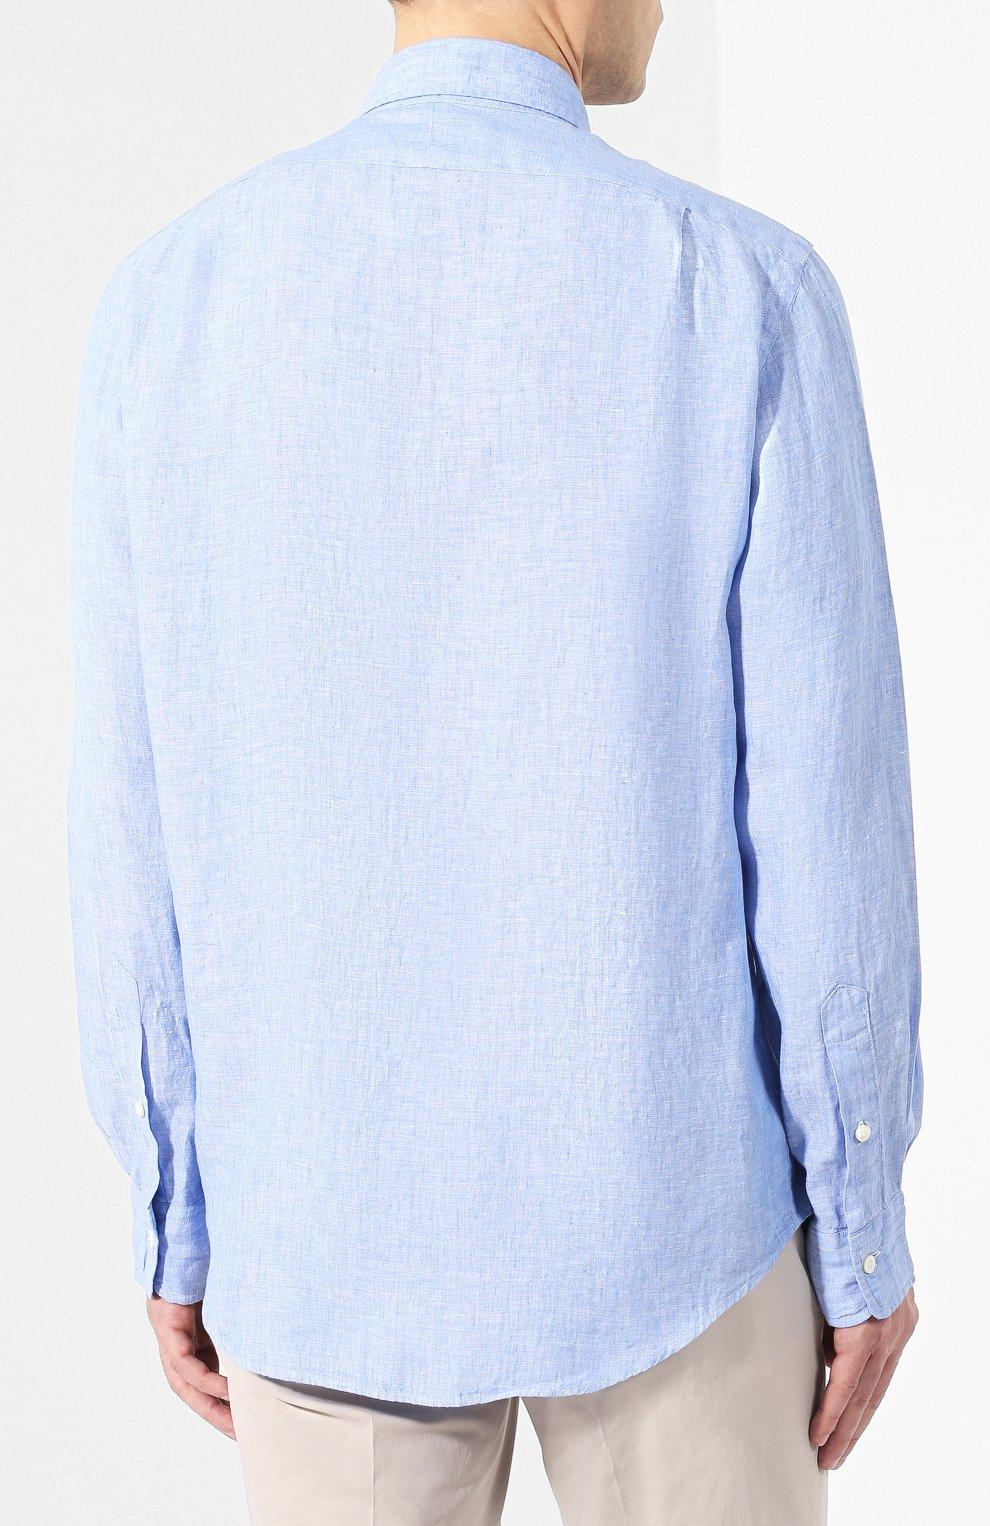 8f7ae31cf61 Мужская голубая льняная рубашка POLO RALPH LAUREN — купить за 10950 ...